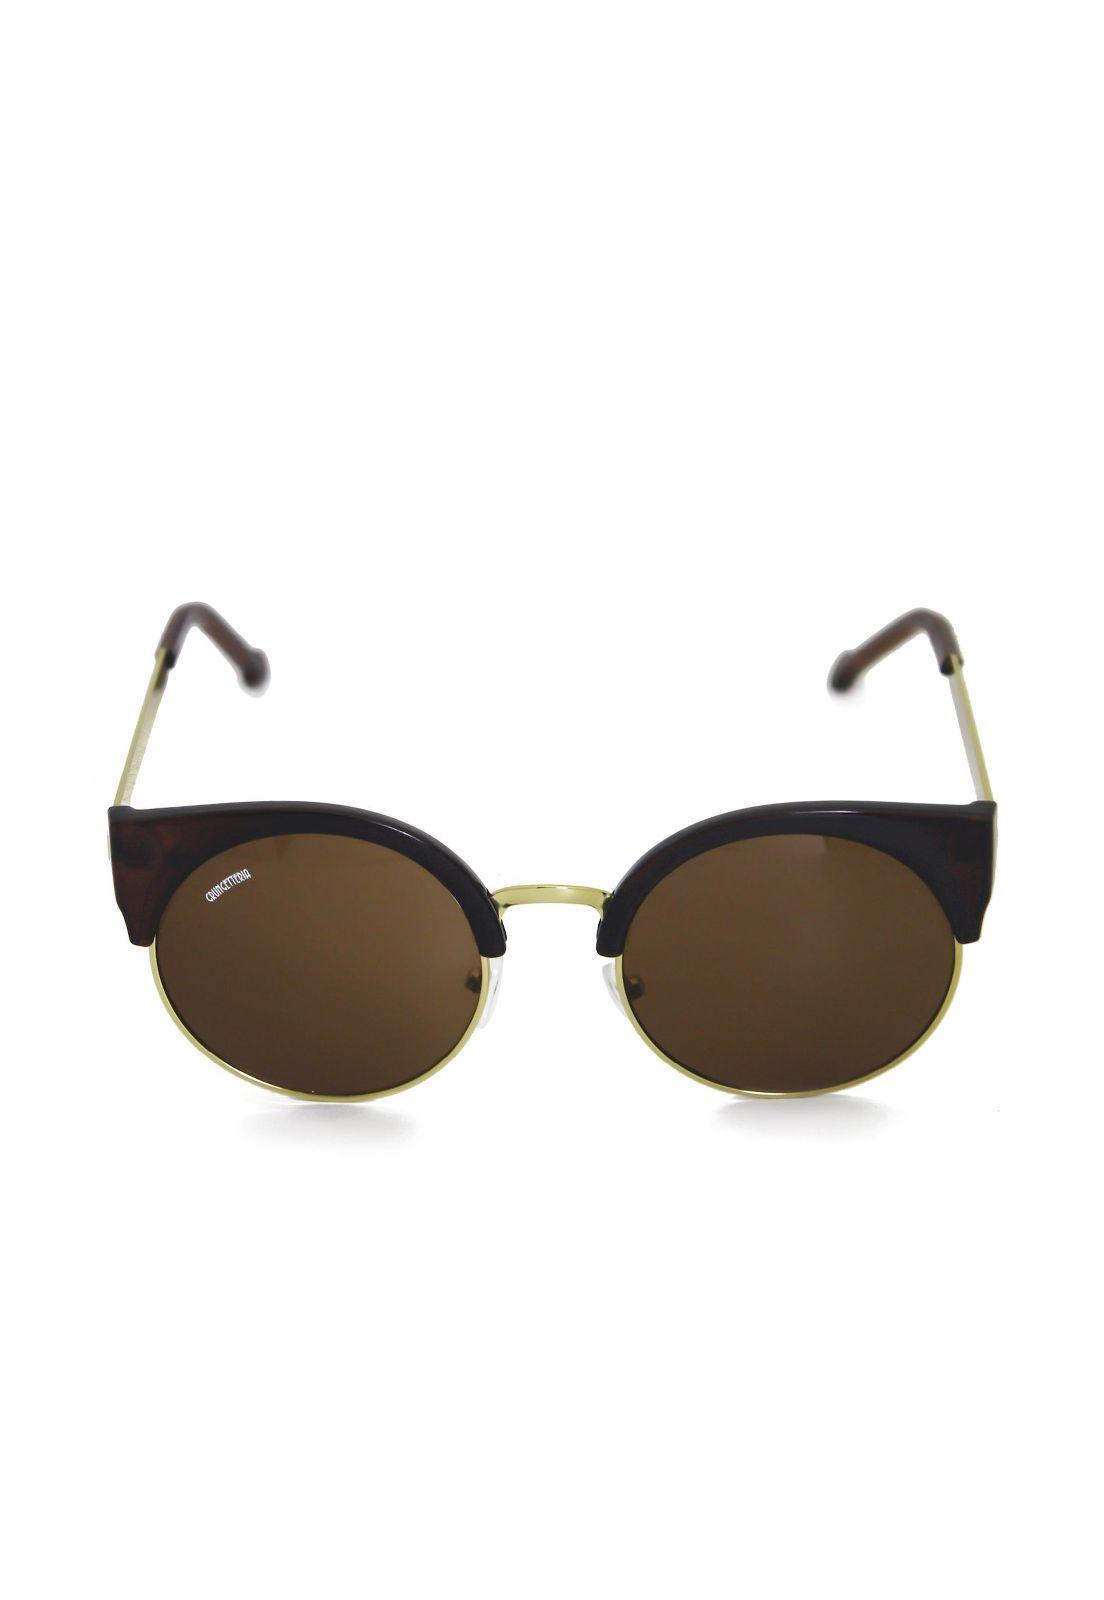 Óculos de Sol Grungetteria Miss Kitty Marrom